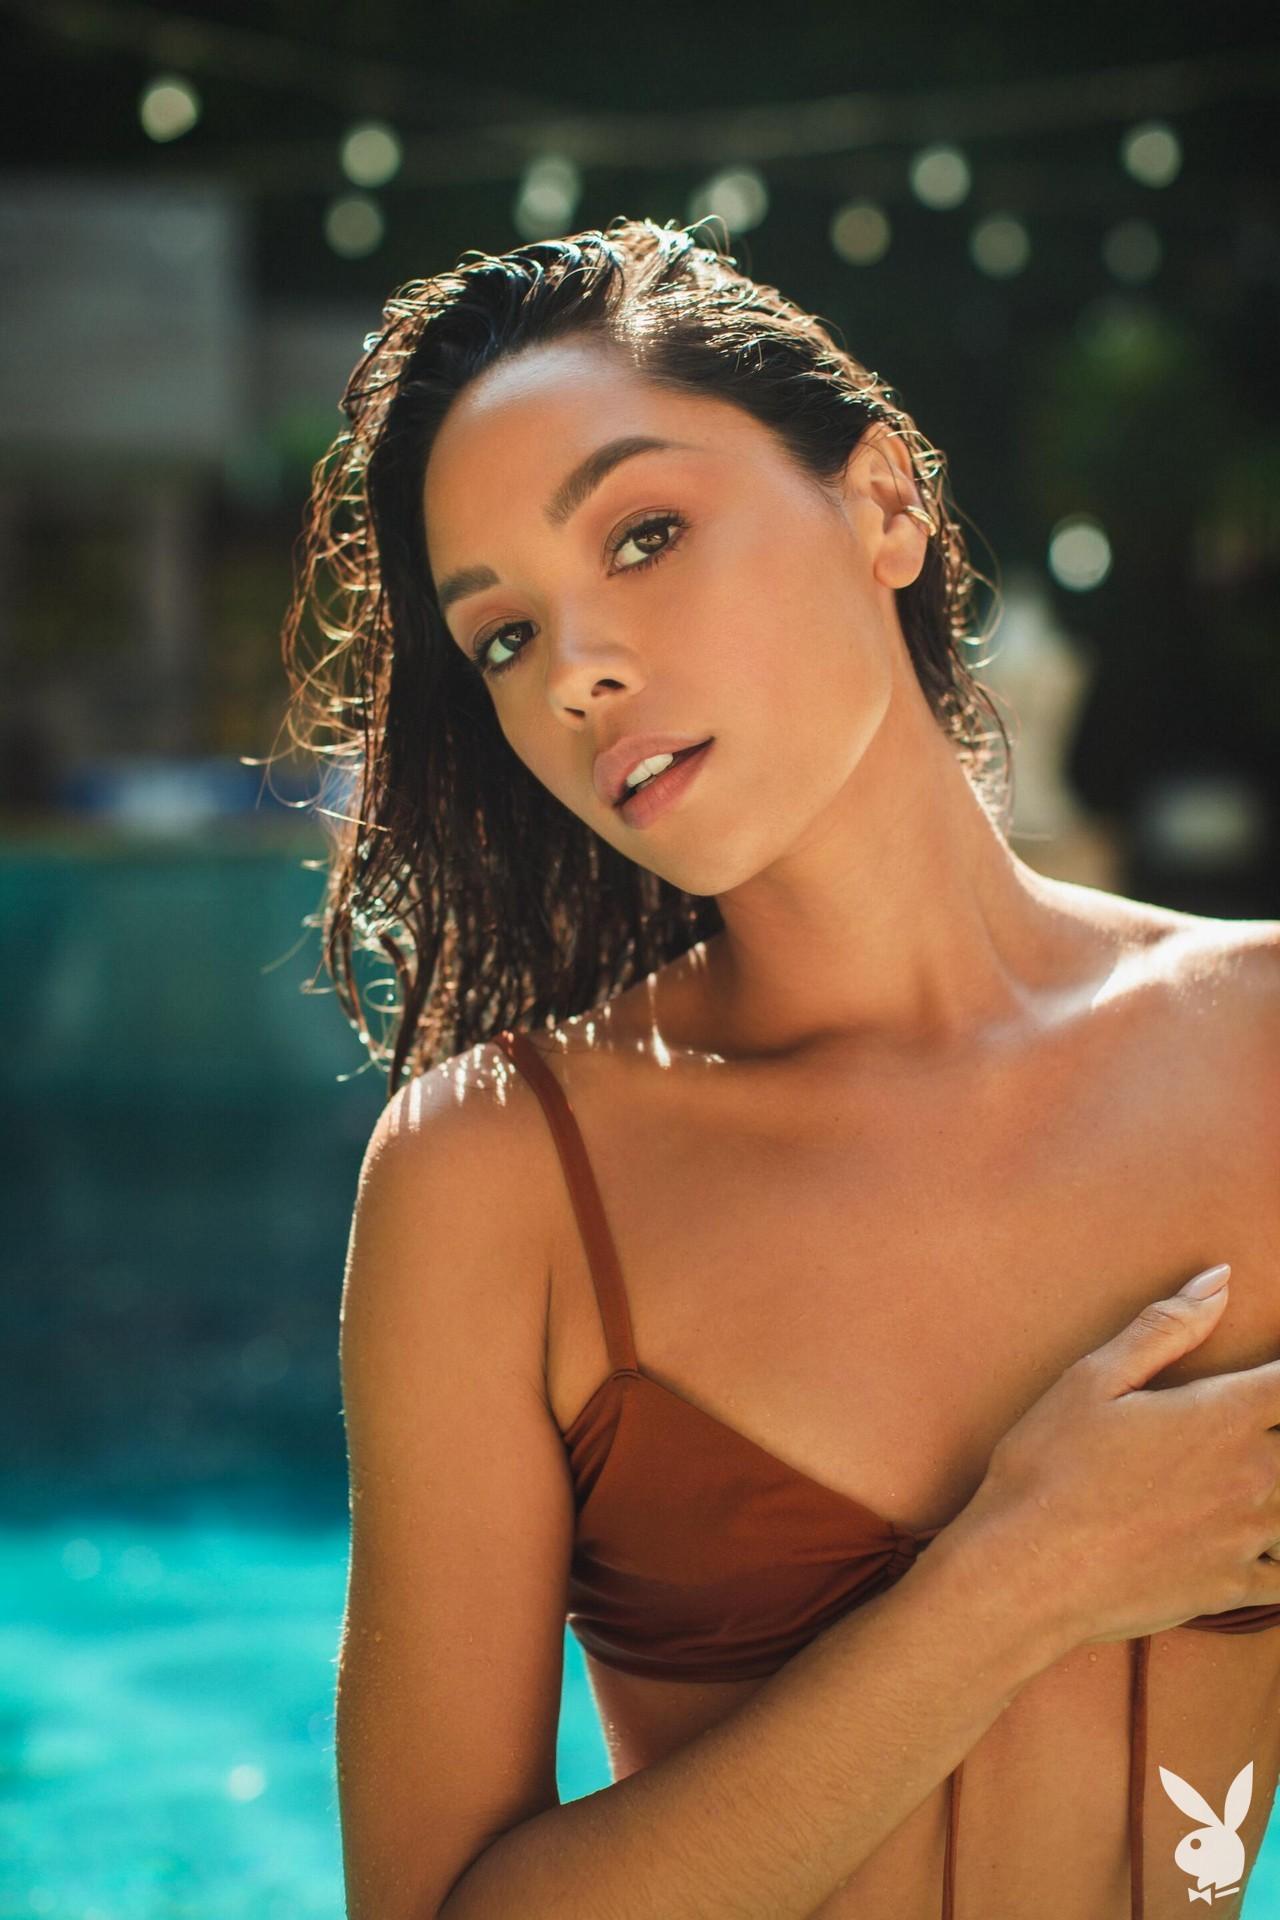 Danielle Alcaraz Playmate Outtakes Playboy Plus (28)